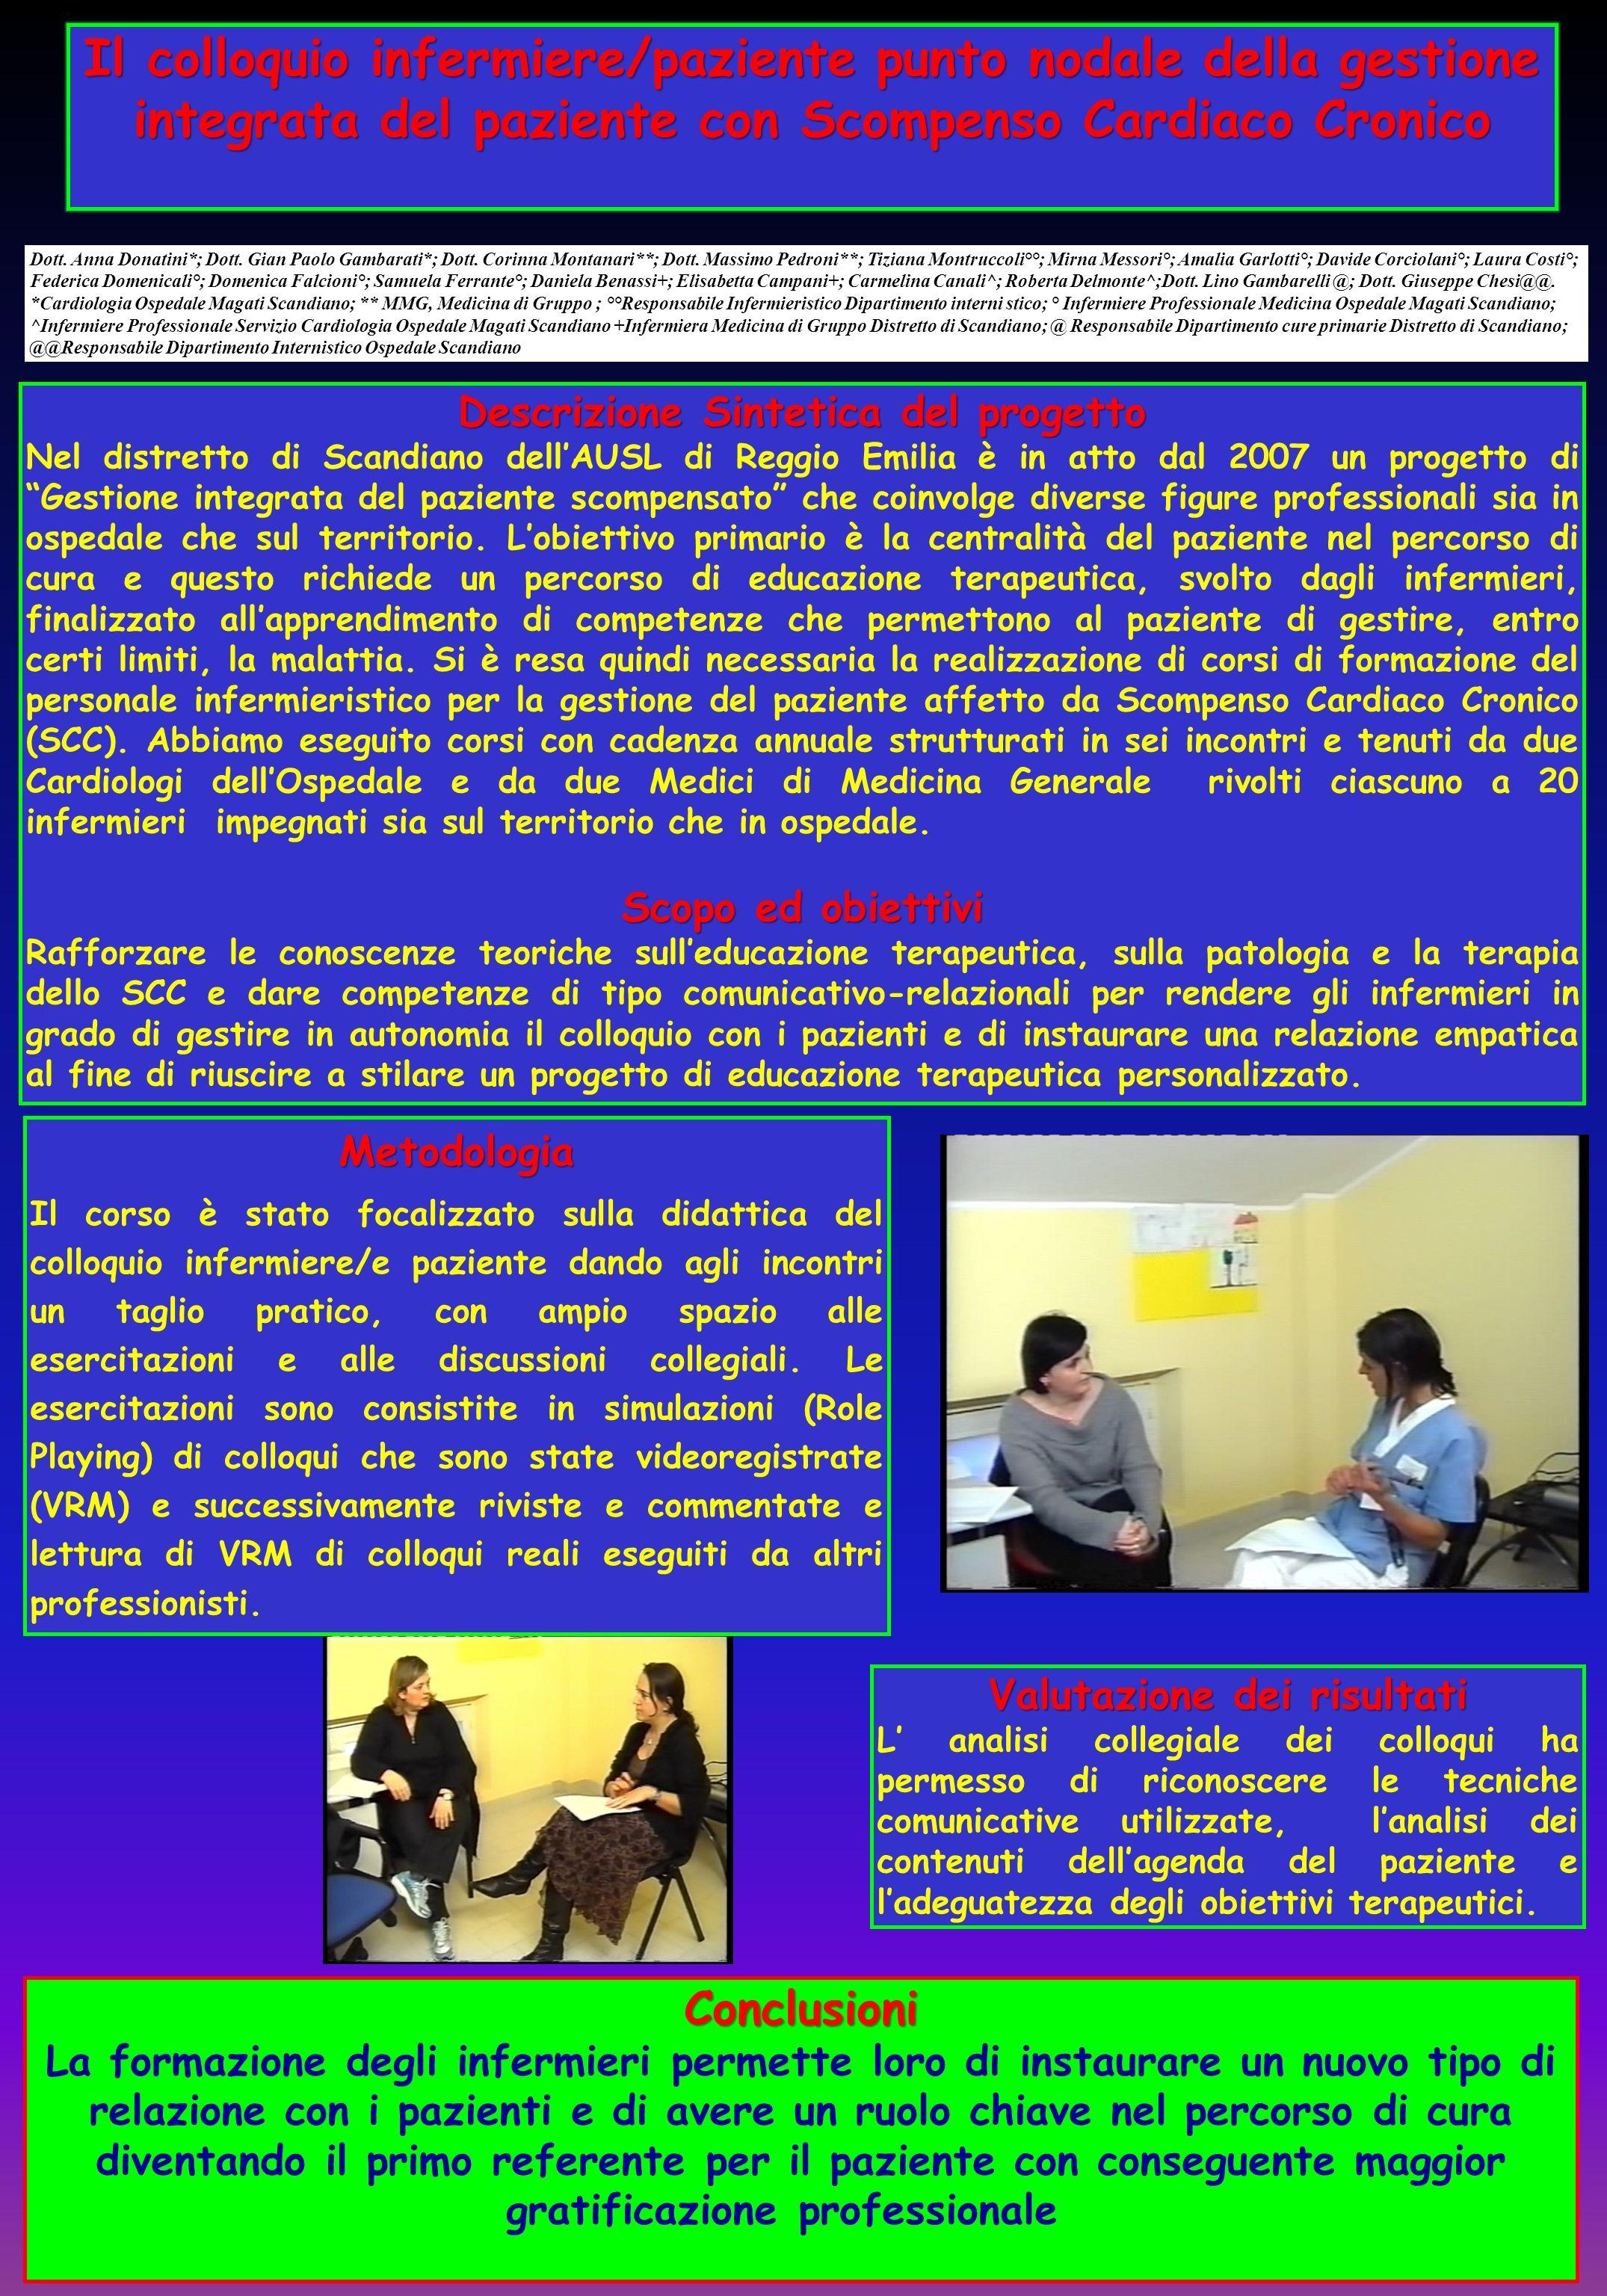 Dott. Anna Donatini*; Dott. Gian Paolo Gambarati*; Dott. Corinna Montanari**; Dott. Massimo Pedroni**; Tiziana Montruccoli°°; Mirna Messori°; Amalia G